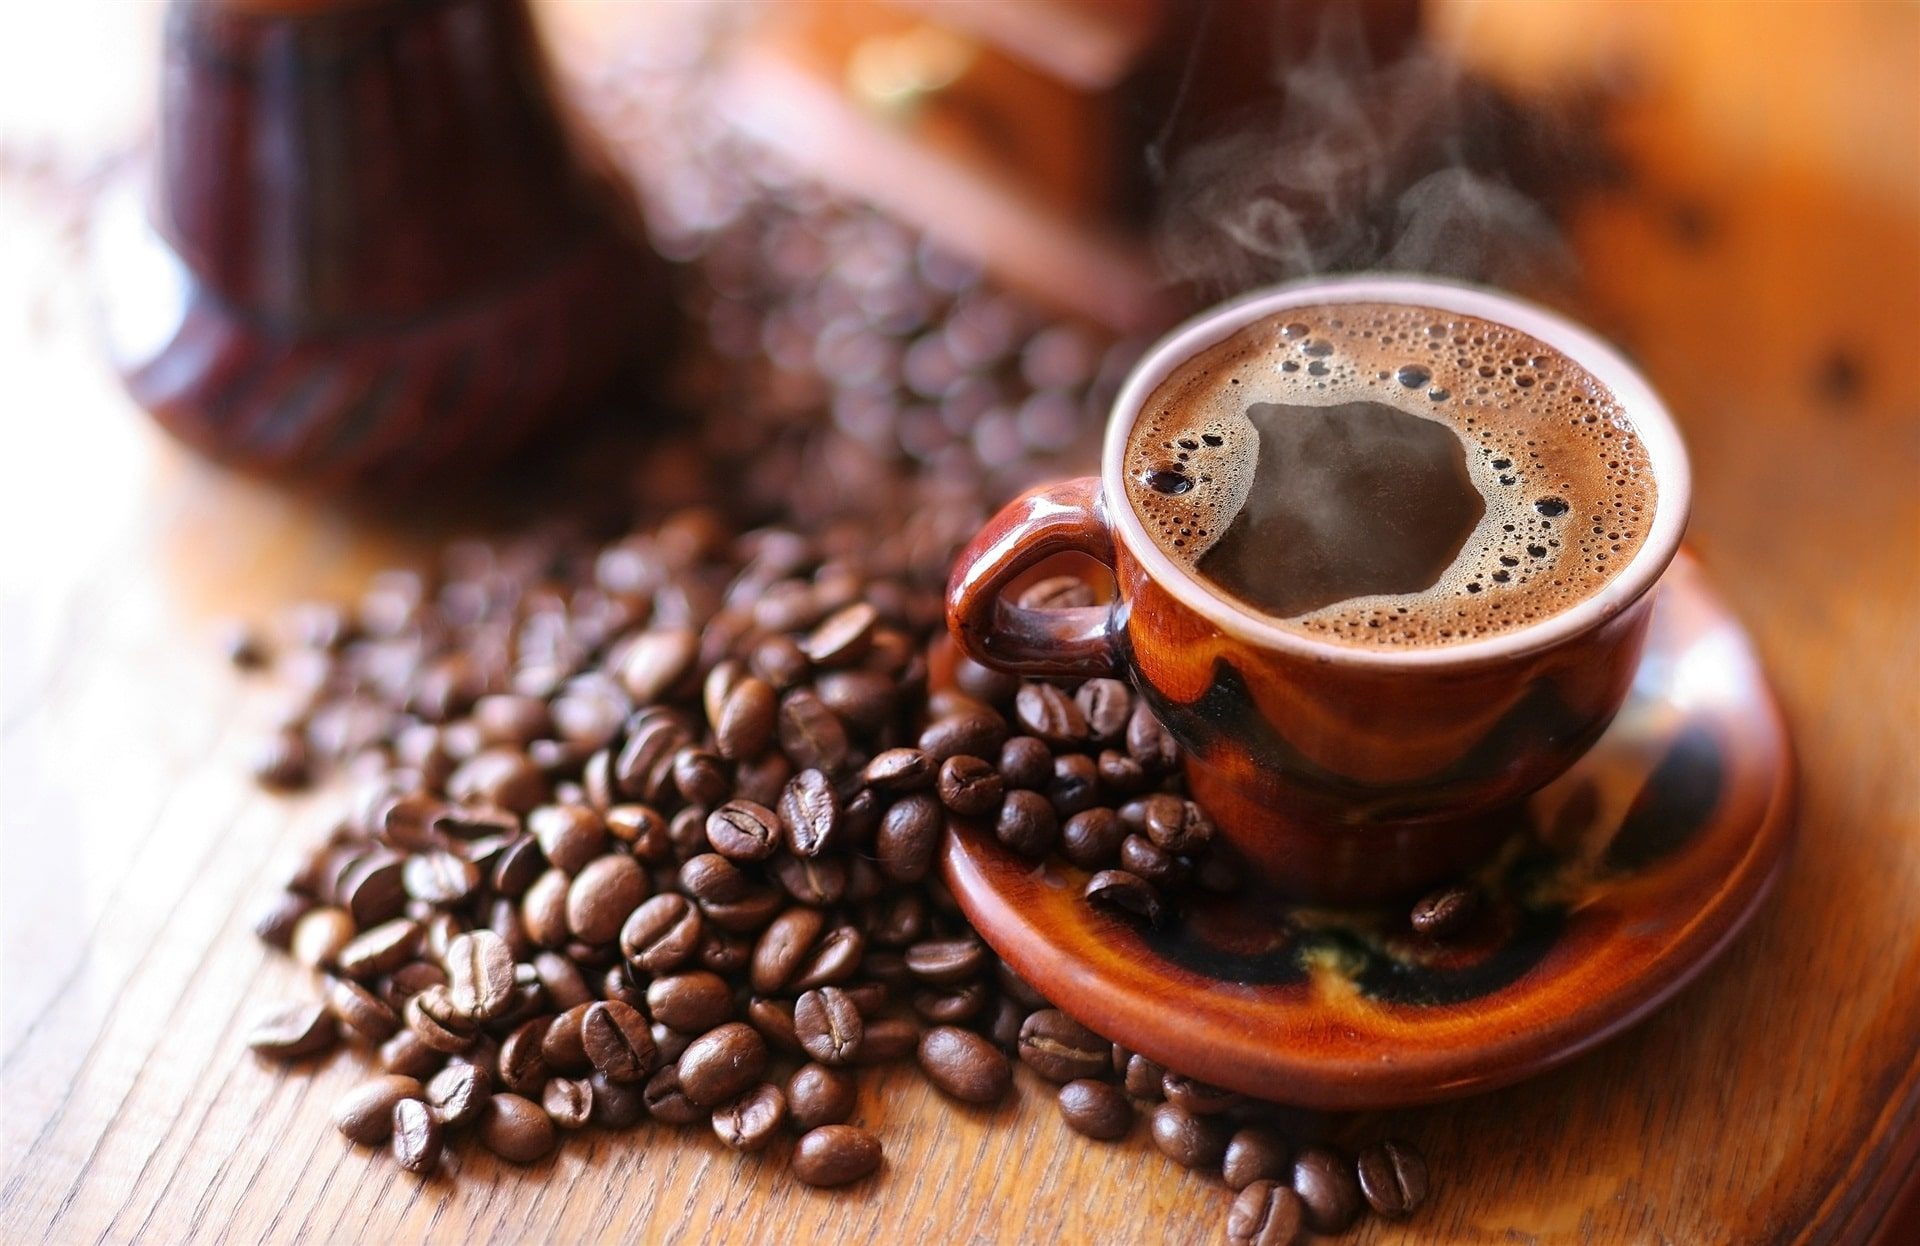 http://www.divinatix.com/wp-content/uploads/2015/02/mozaic-cafe.jpg